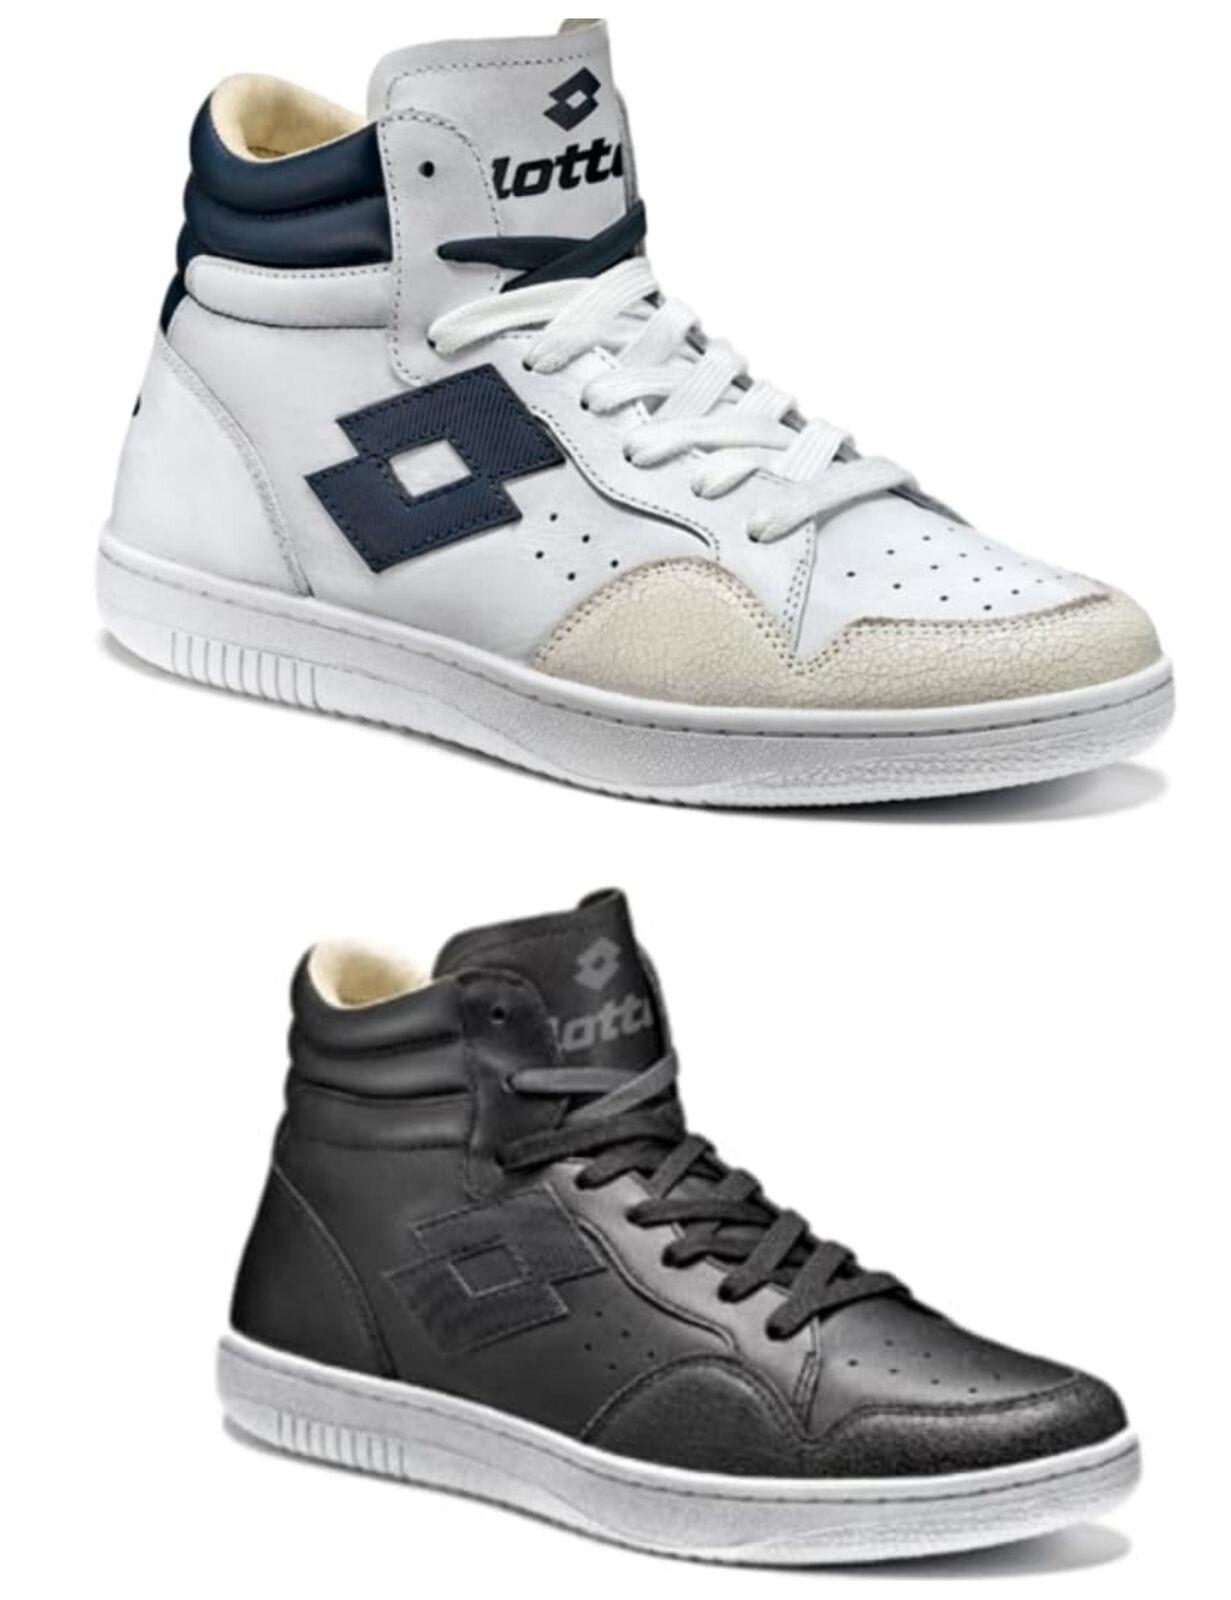 Chaussures Lotto Icône en cuir blanc S9985 Baskets Homme bleu rouge